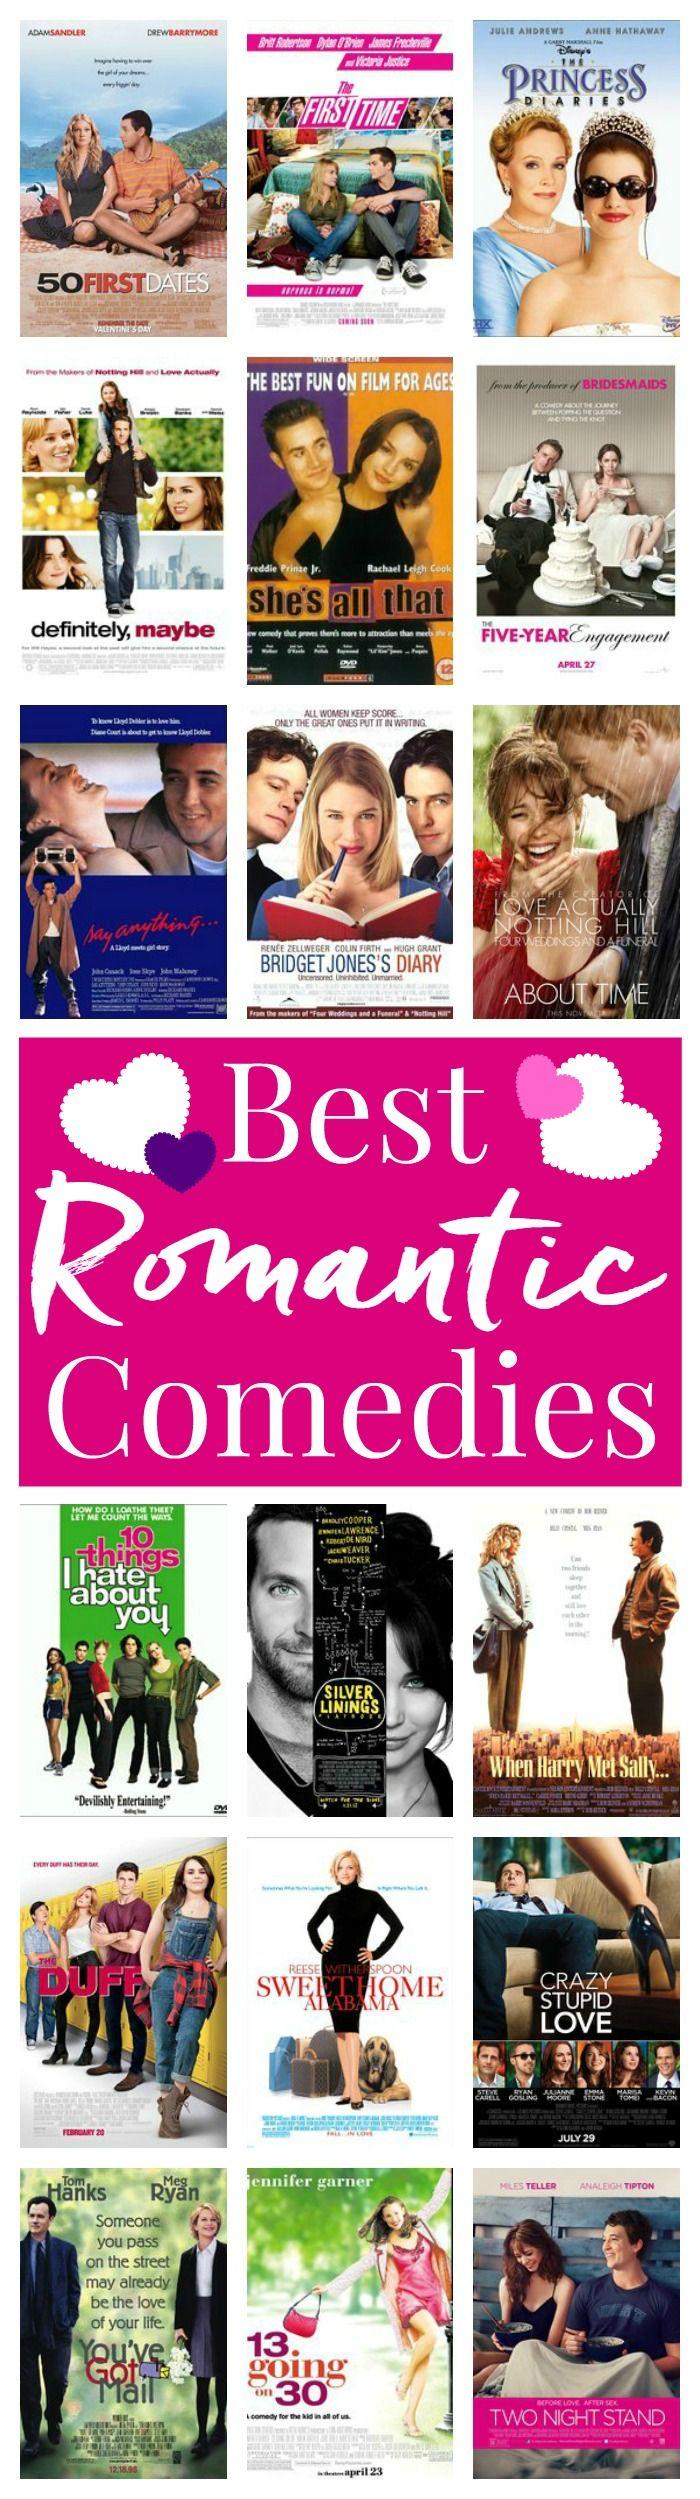 Best 25 Romantic Comedy Anime Ideas On Pinterest: Best 25+ Best Romantic Comedies Ideas On Pinterest